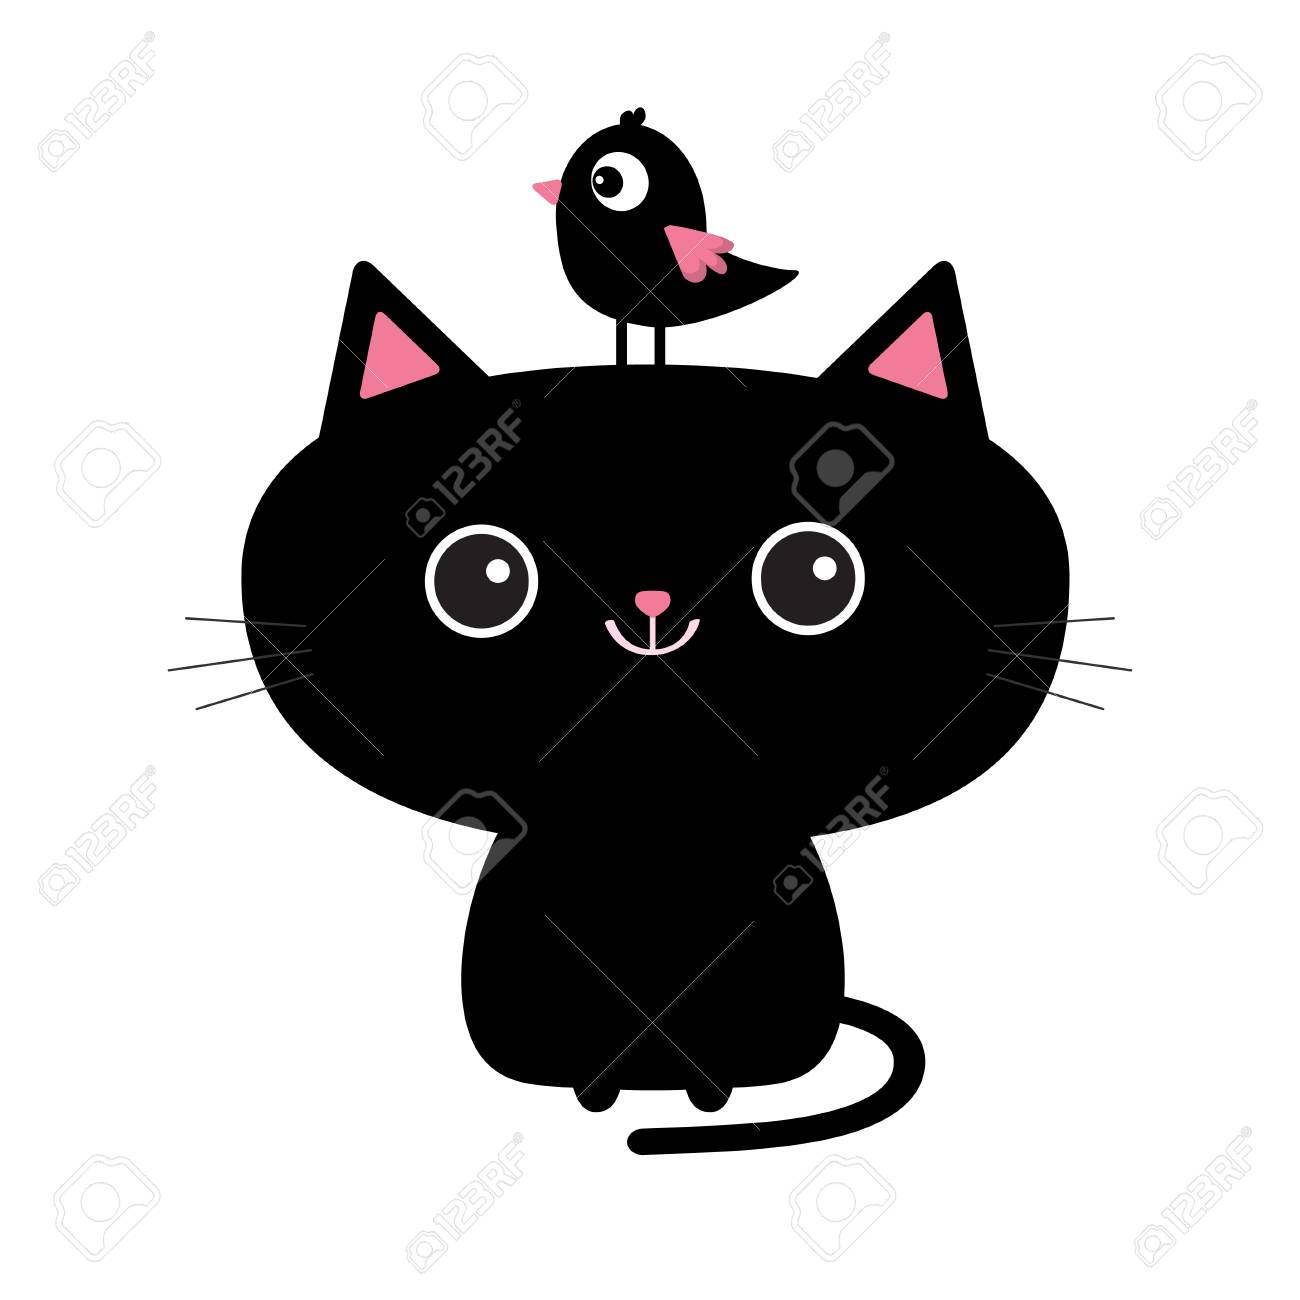 Cute Black Cat Icon Bird Sitting On Head Face Funny Cartoon